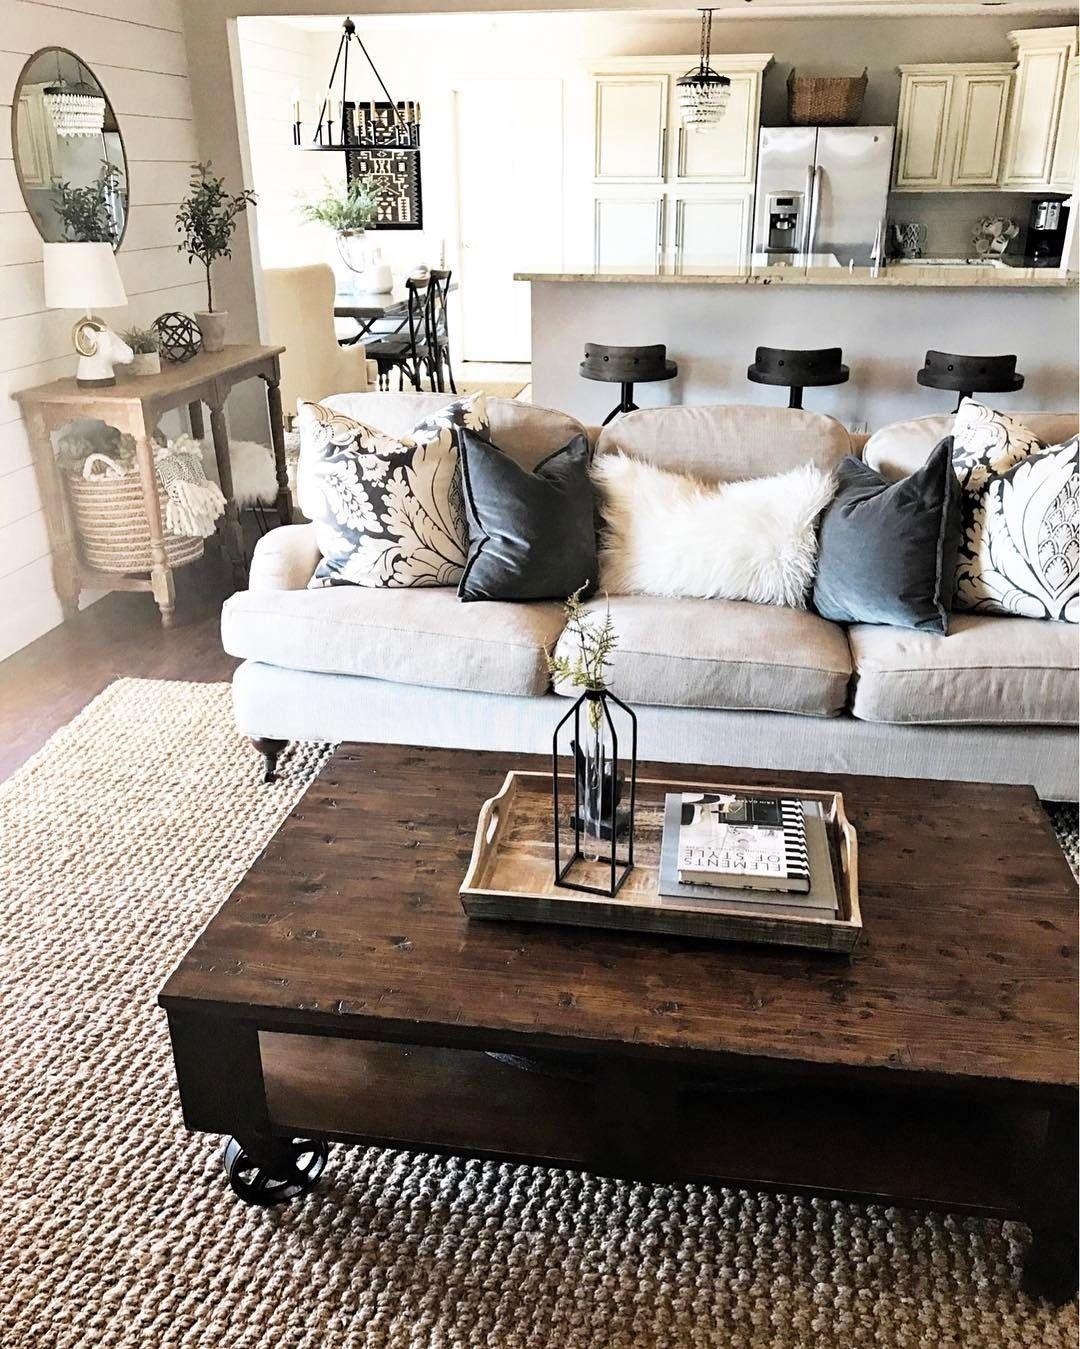 100 Rustic Decor Ideas For Modern Home Farm House Living Room Farmhouse Style Living Room Farmhouse Decor Living Room